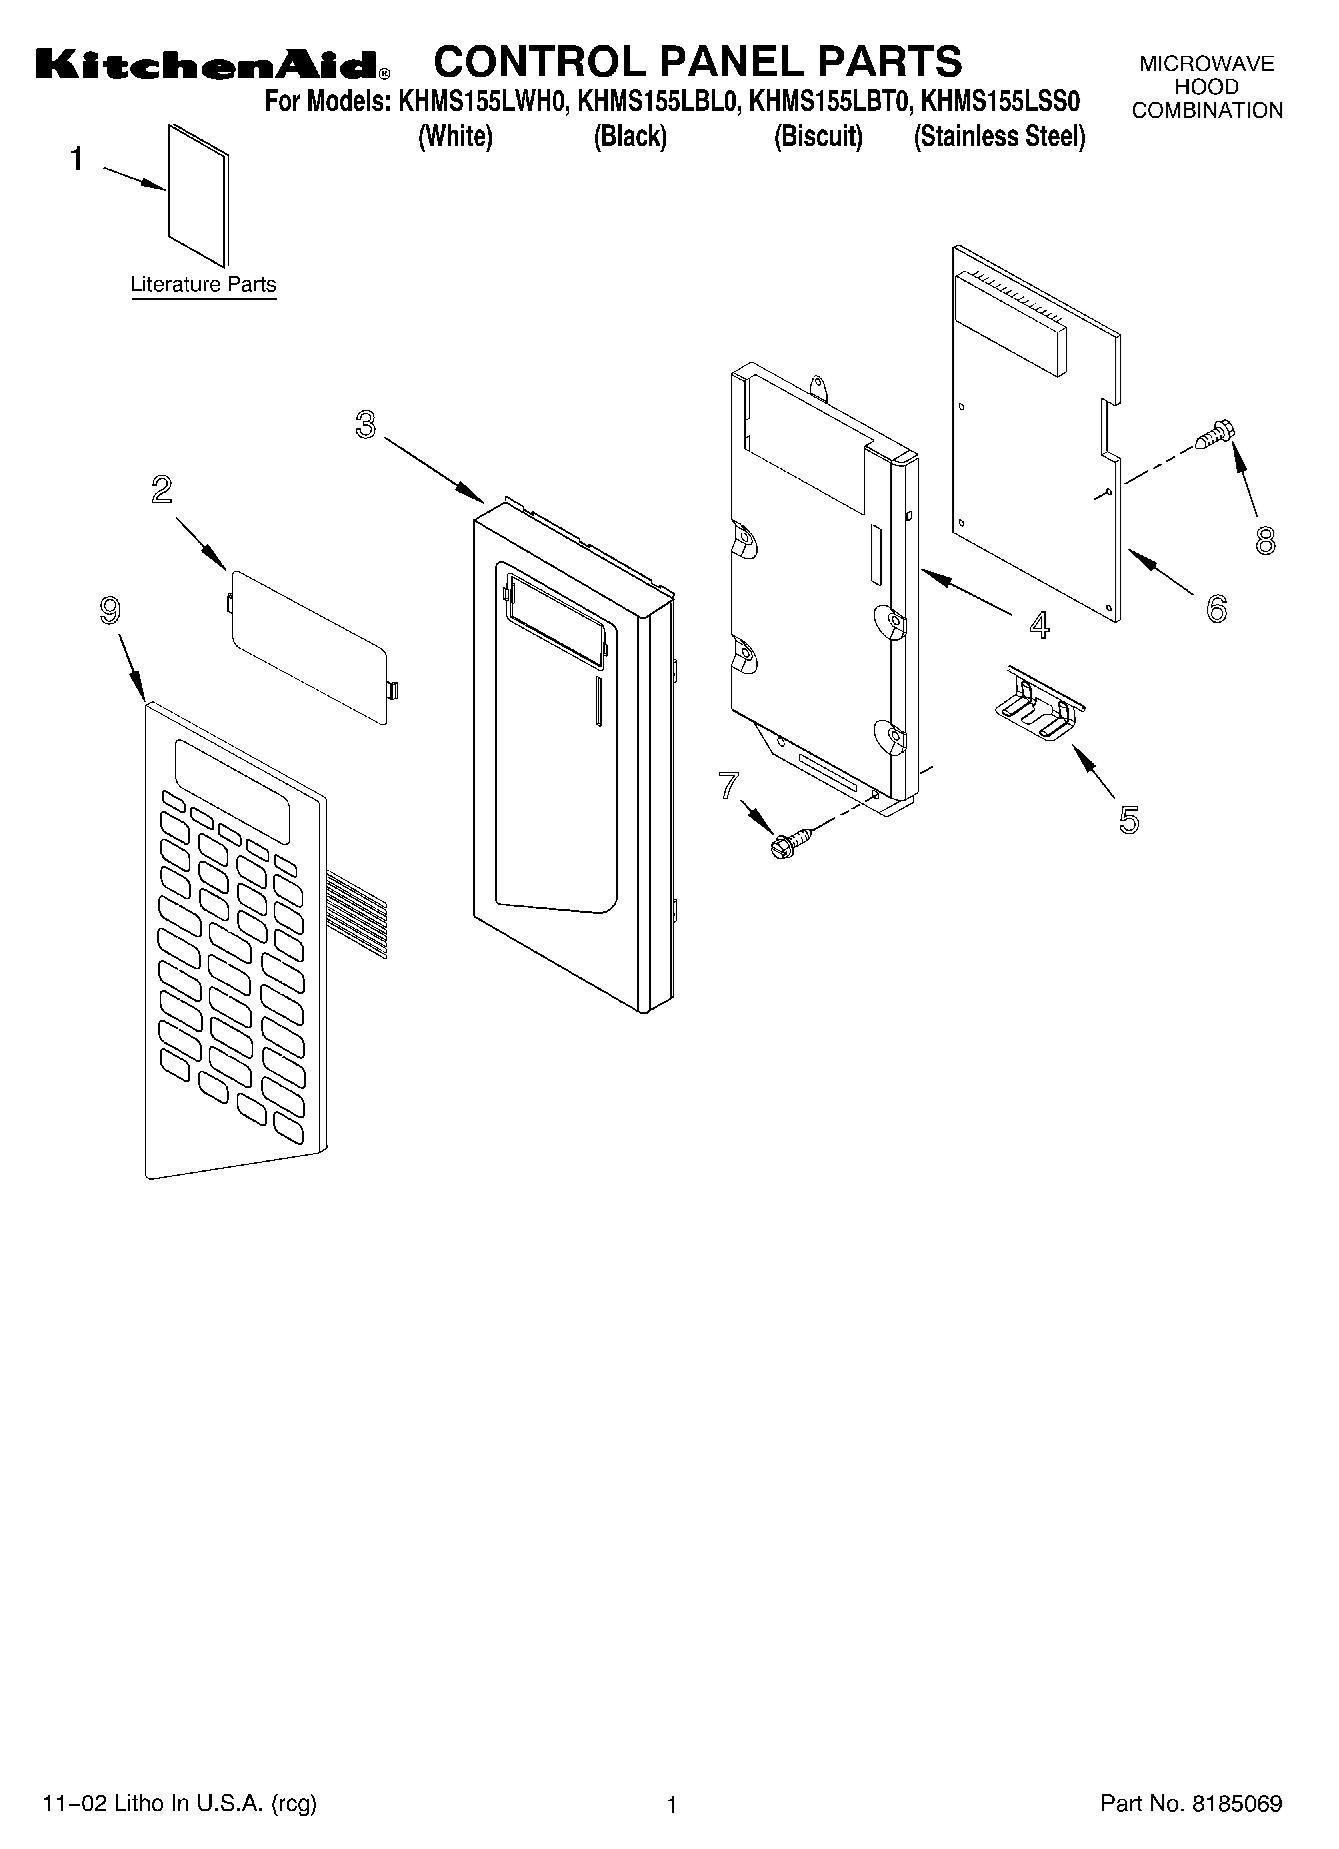 Kitchenaid Microwave Wiring Diagram